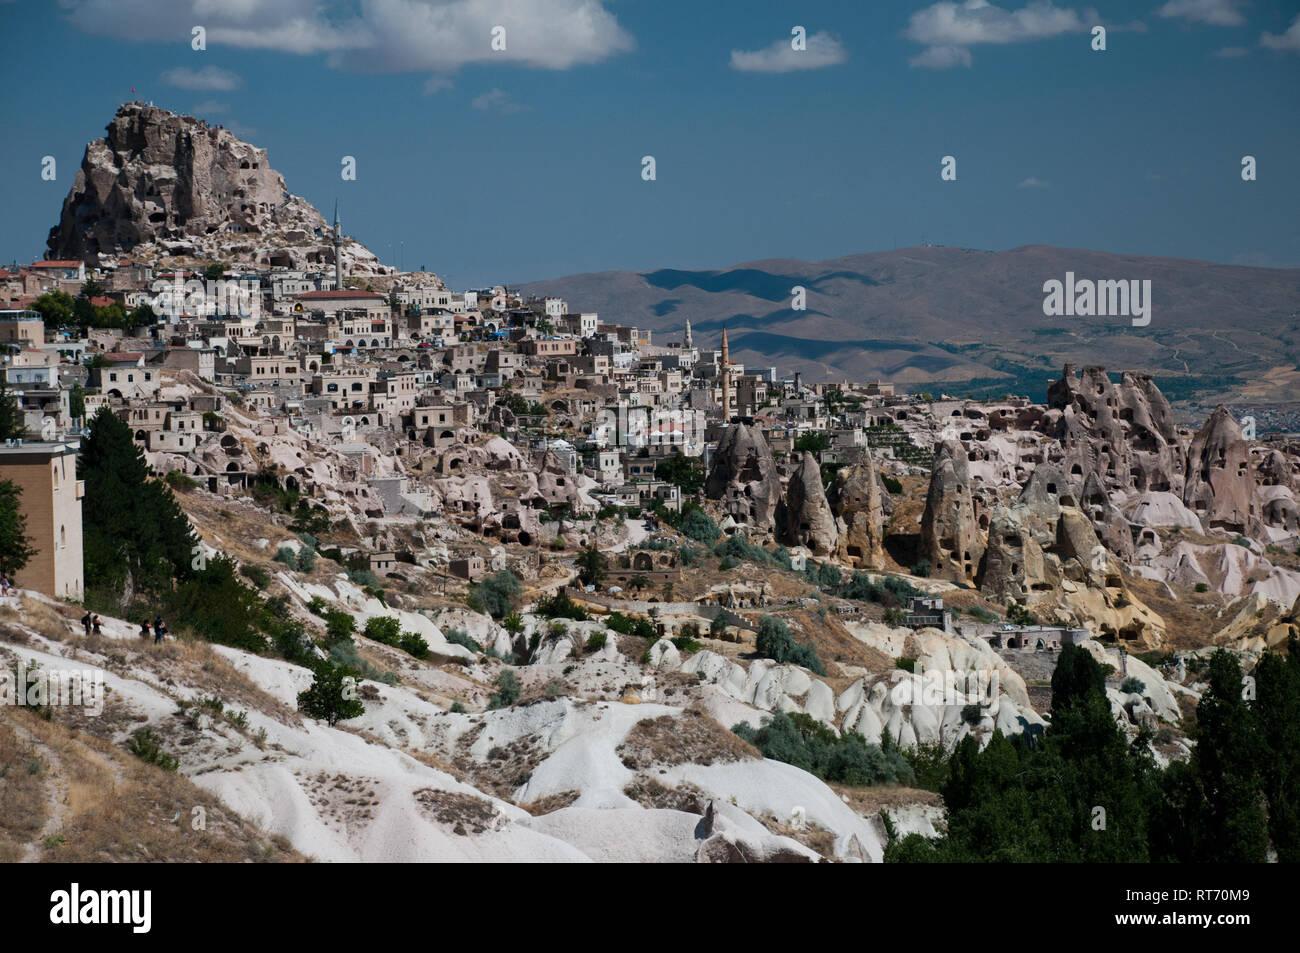 Asia, Turkey, Anatolia, Nevsehir Province, Cappadocia, Uchisar - Stock Image